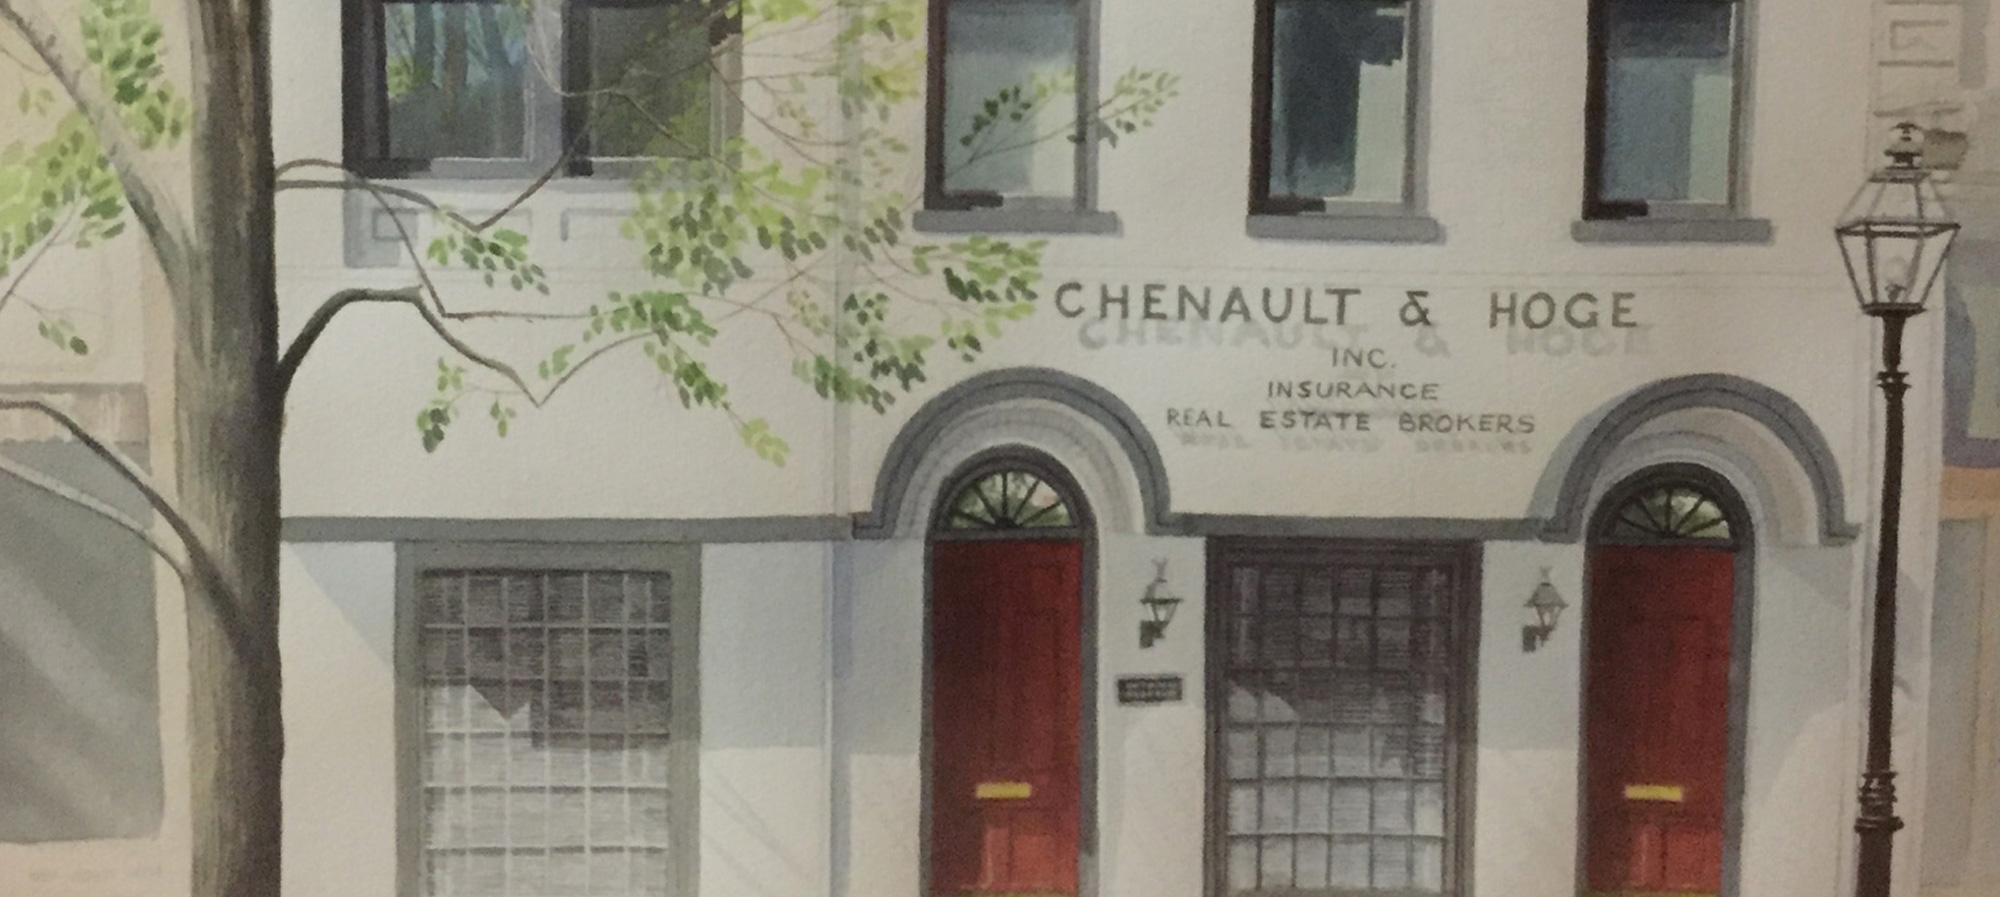 Chenault & Hoge